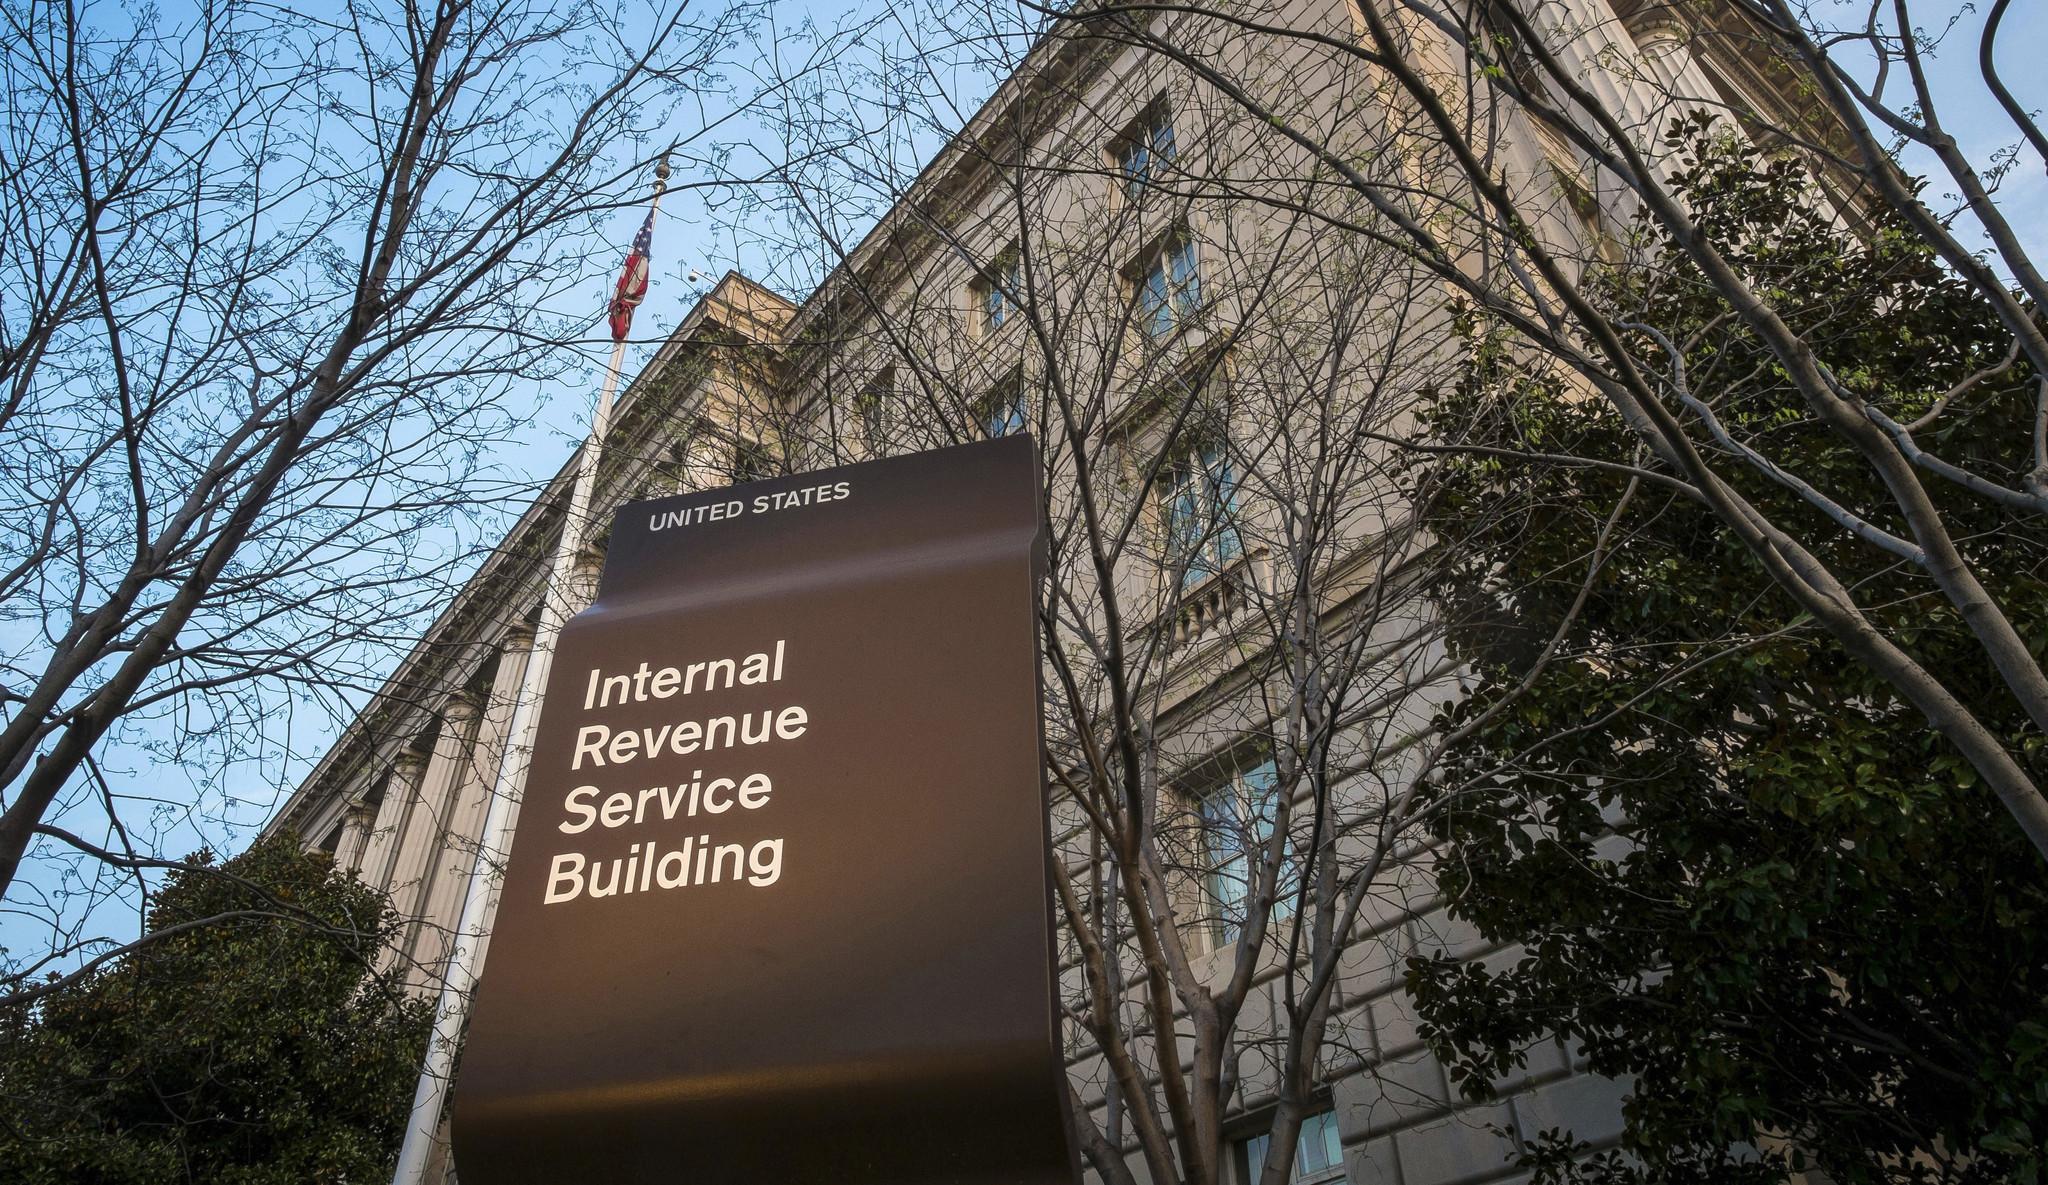 Prepaid Card Users, Under Scrutiny, Find Tax Refunds Frozen  Chicago  Tribune